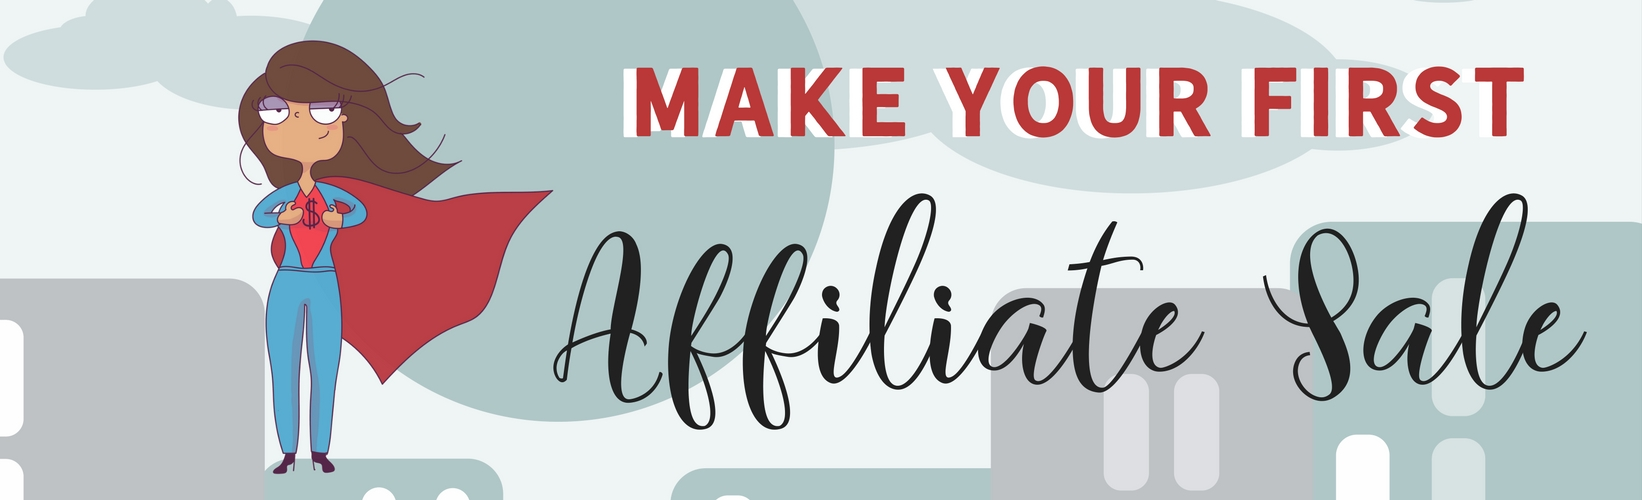 Affiliate marketing tips for new bloggers https://transactions.sendowl.com/stores/7993/47336